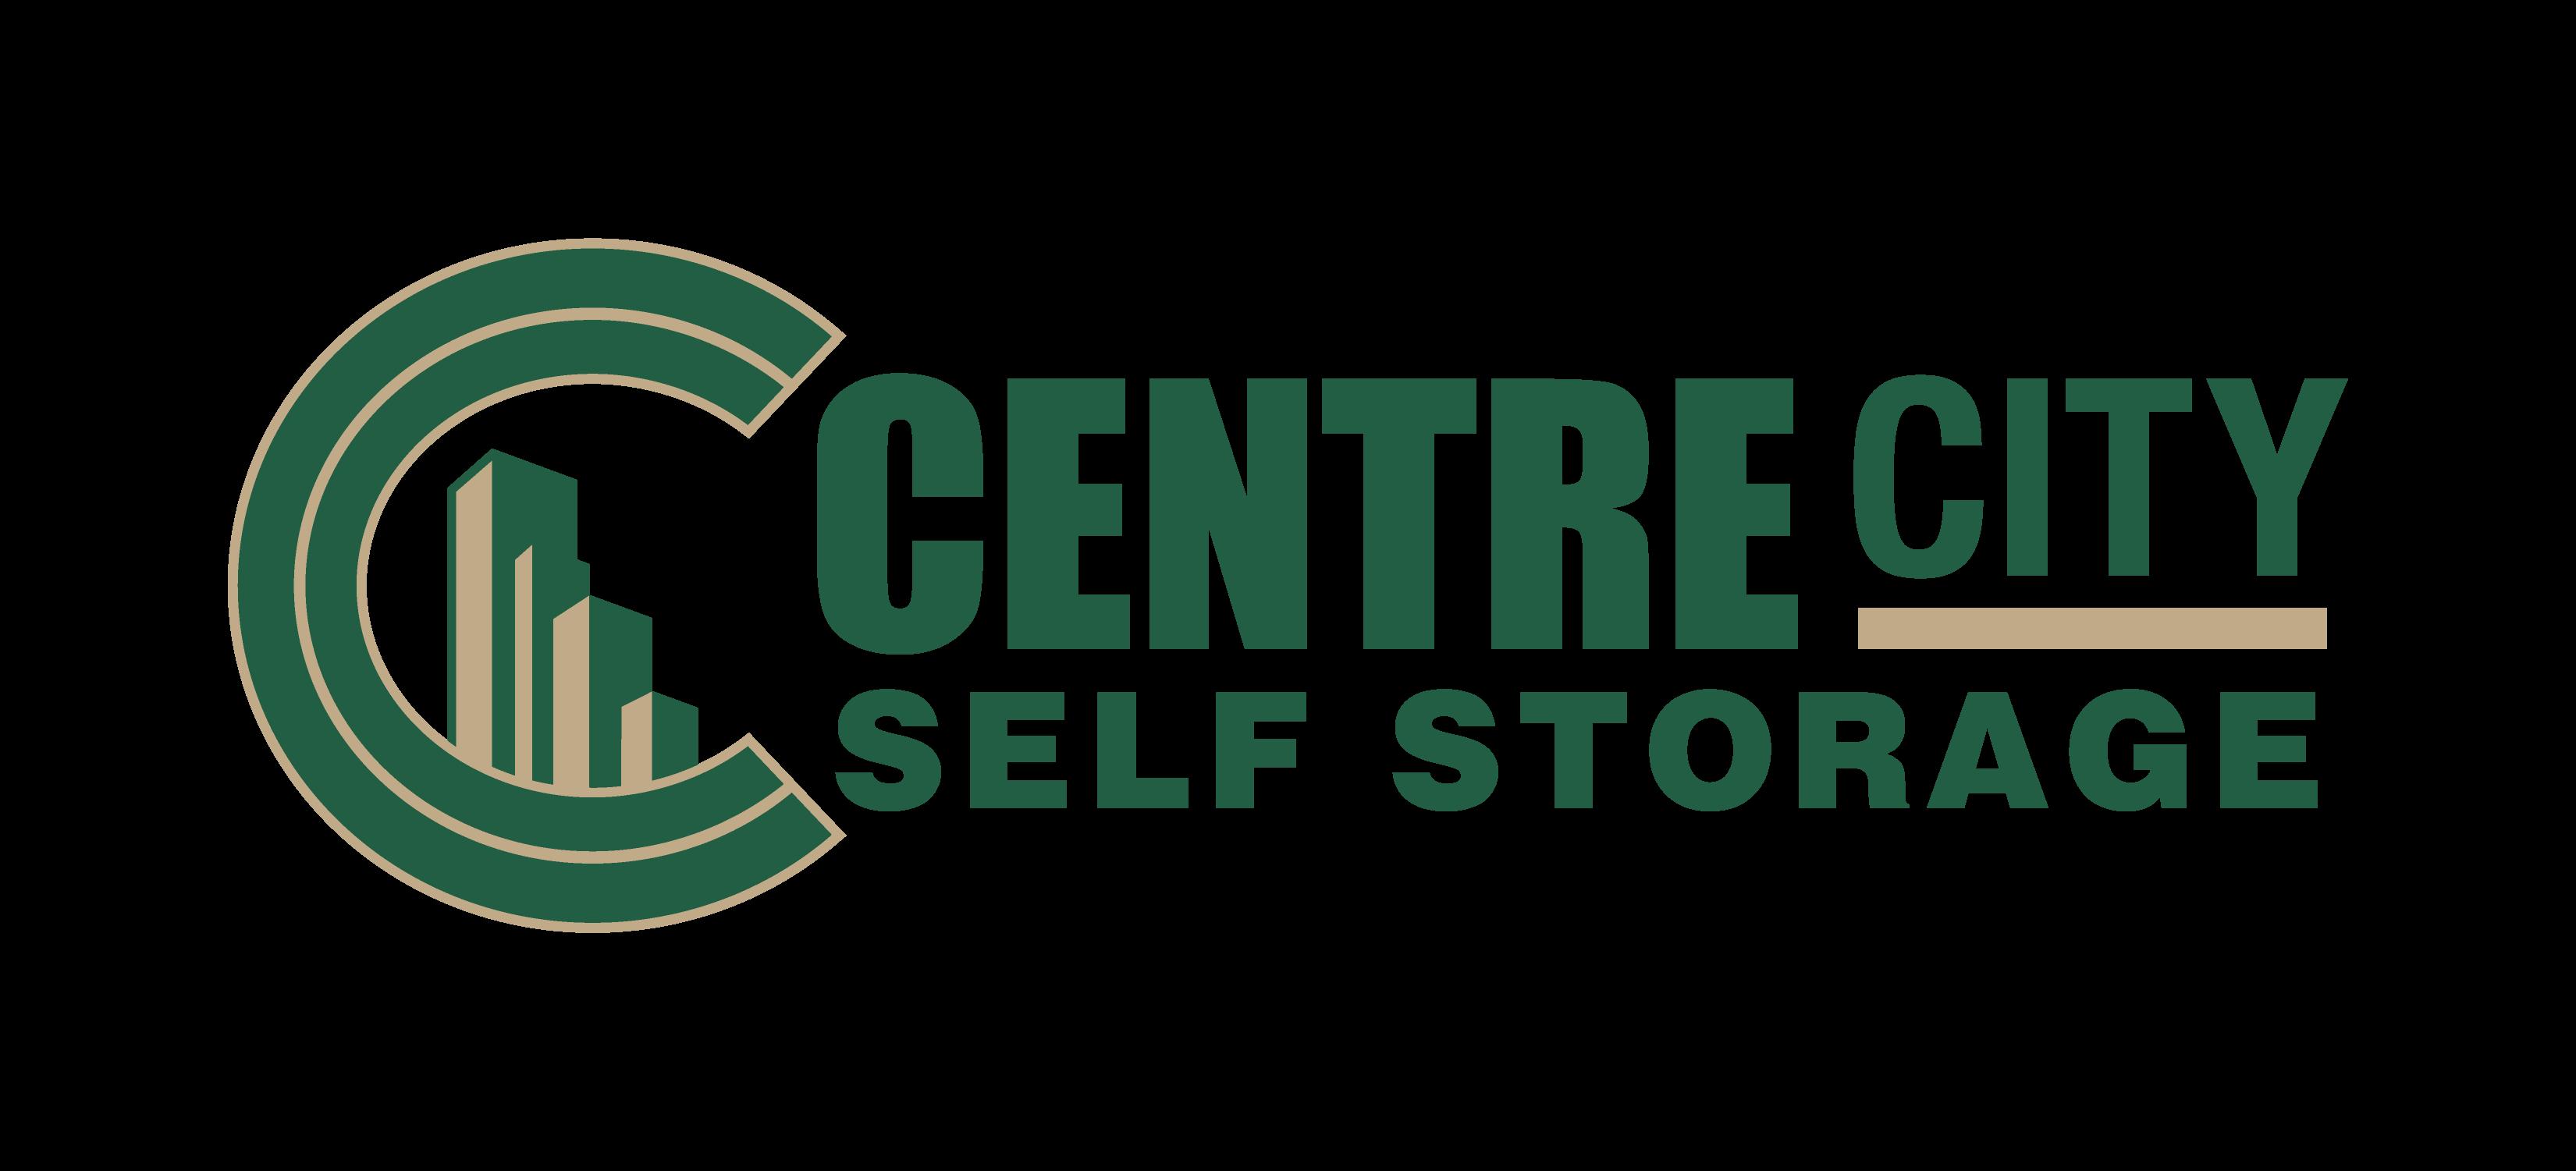 Centre City Self Storage